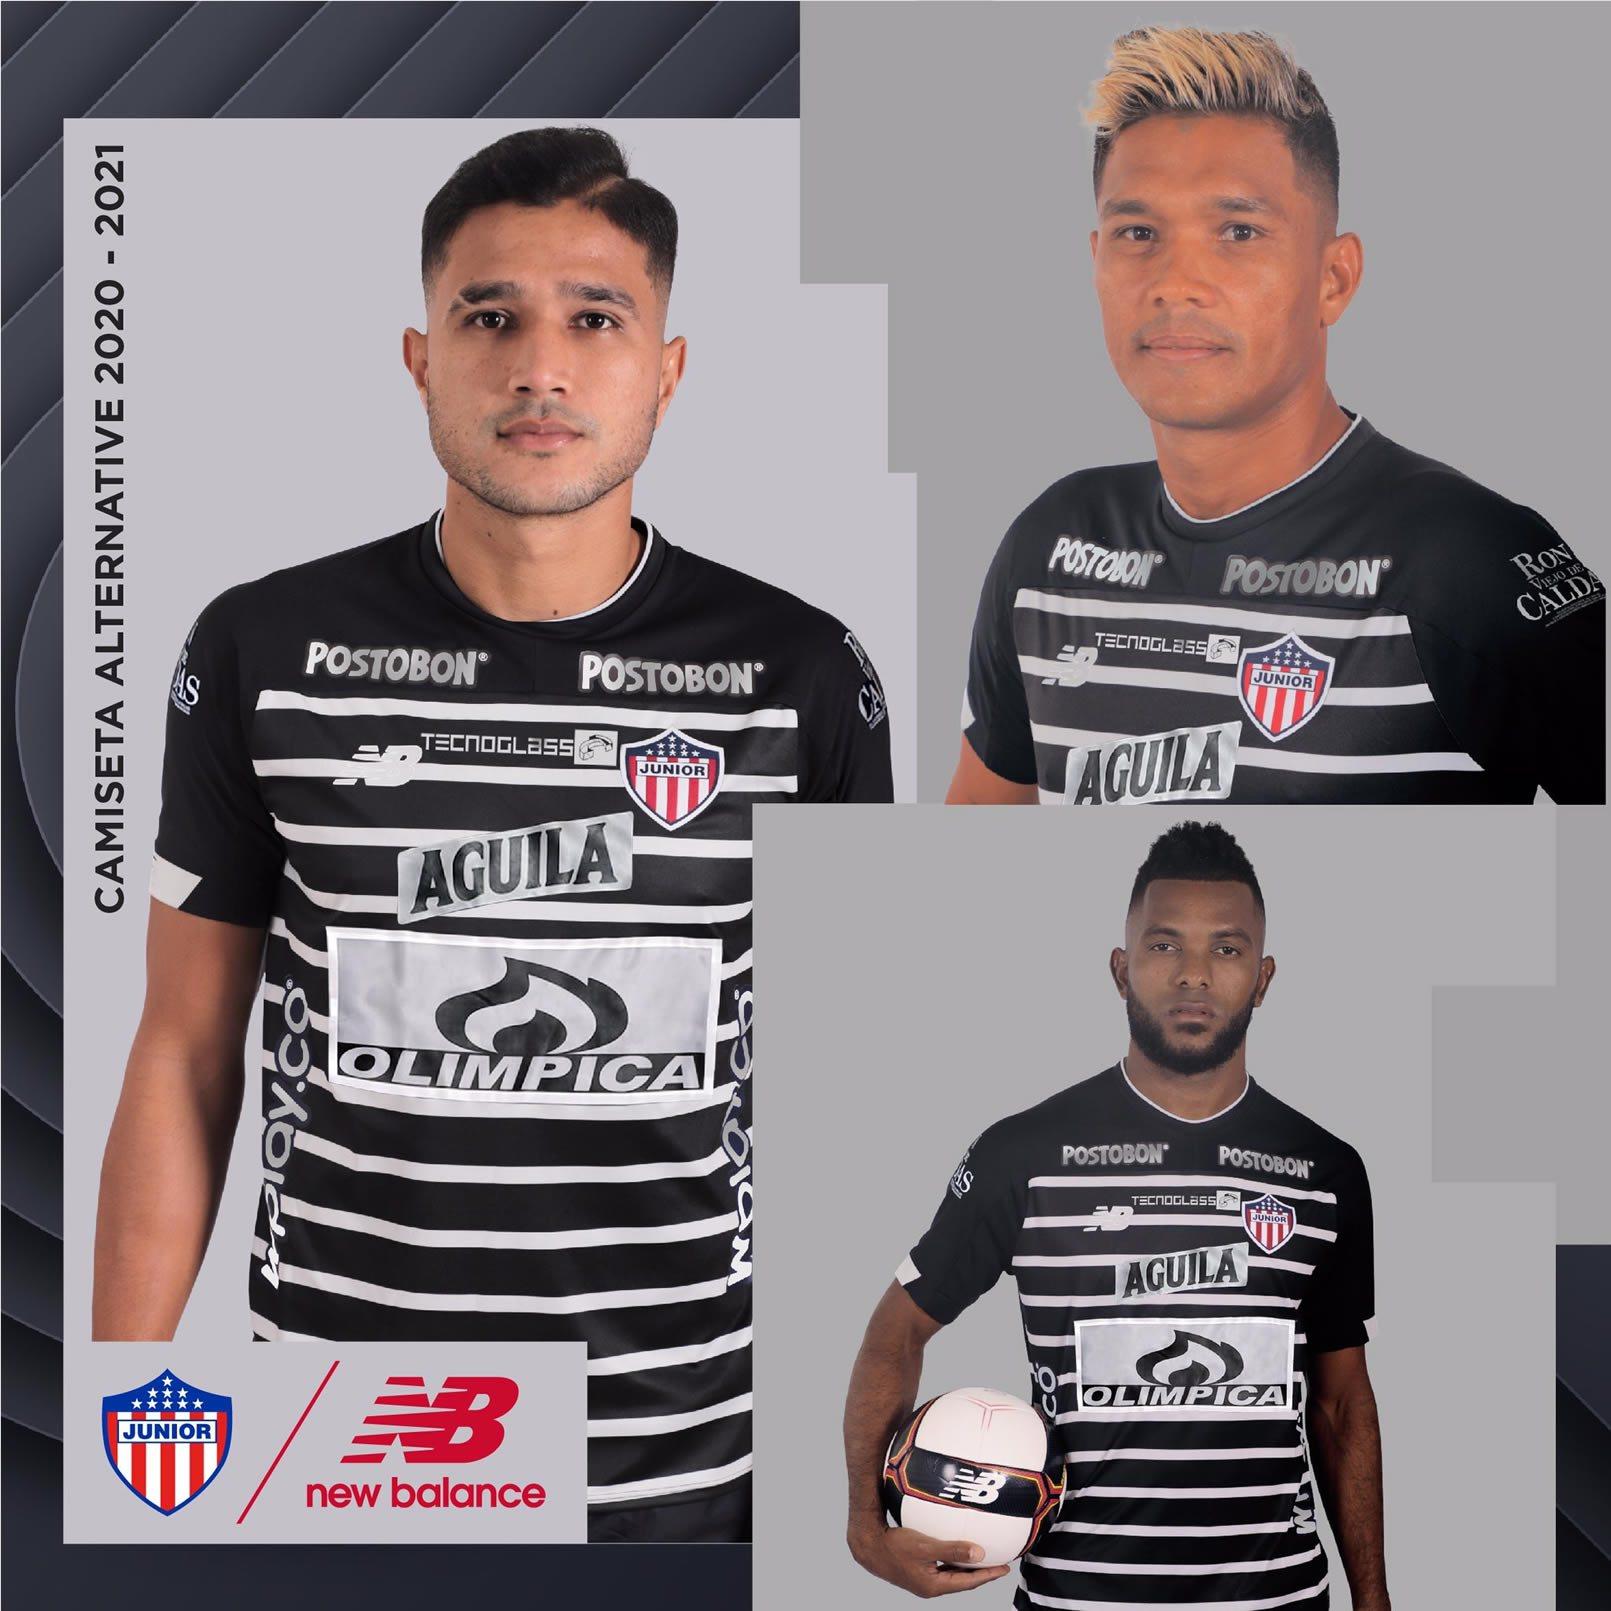 Tercera camiseta New Balance del Junior 2020/21 | Imagen Twitter Oficial